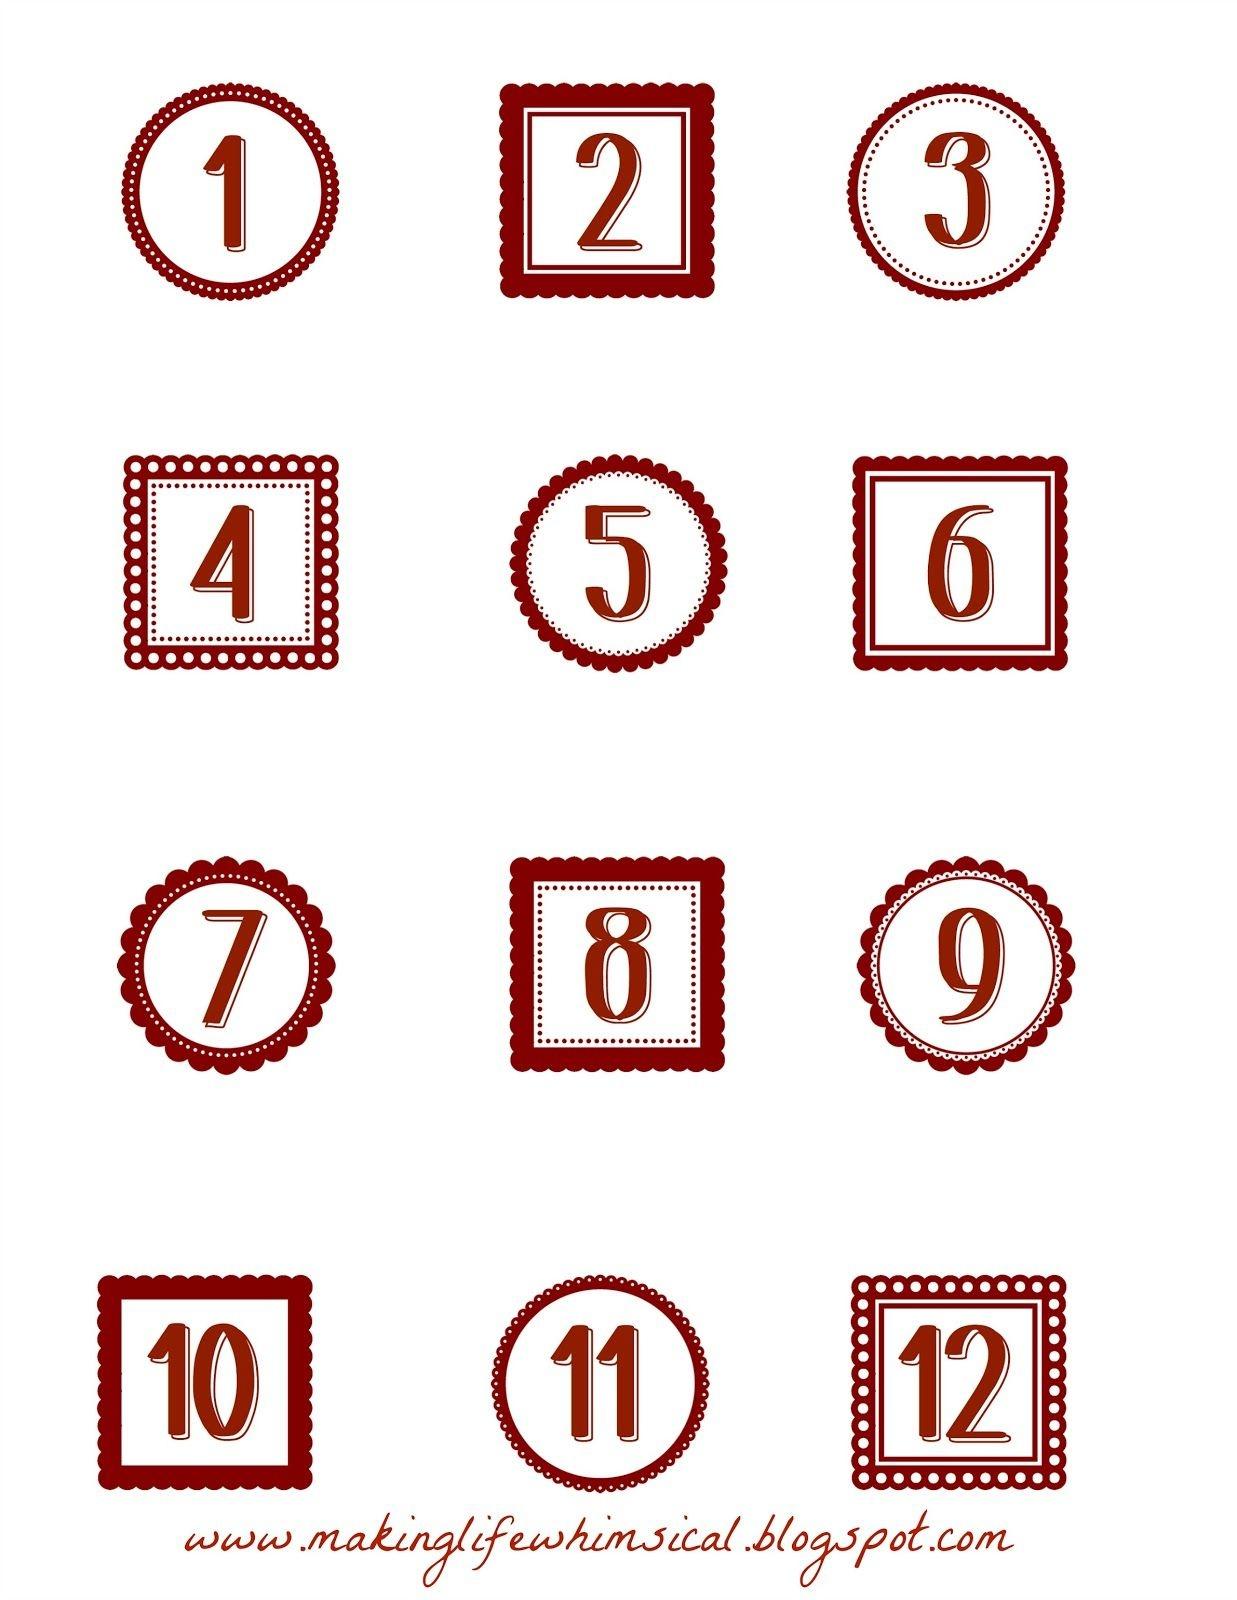 Making Life Whimsical: Free Printablesadvent Numbers | Christmas - Free Printable Advent Numbers